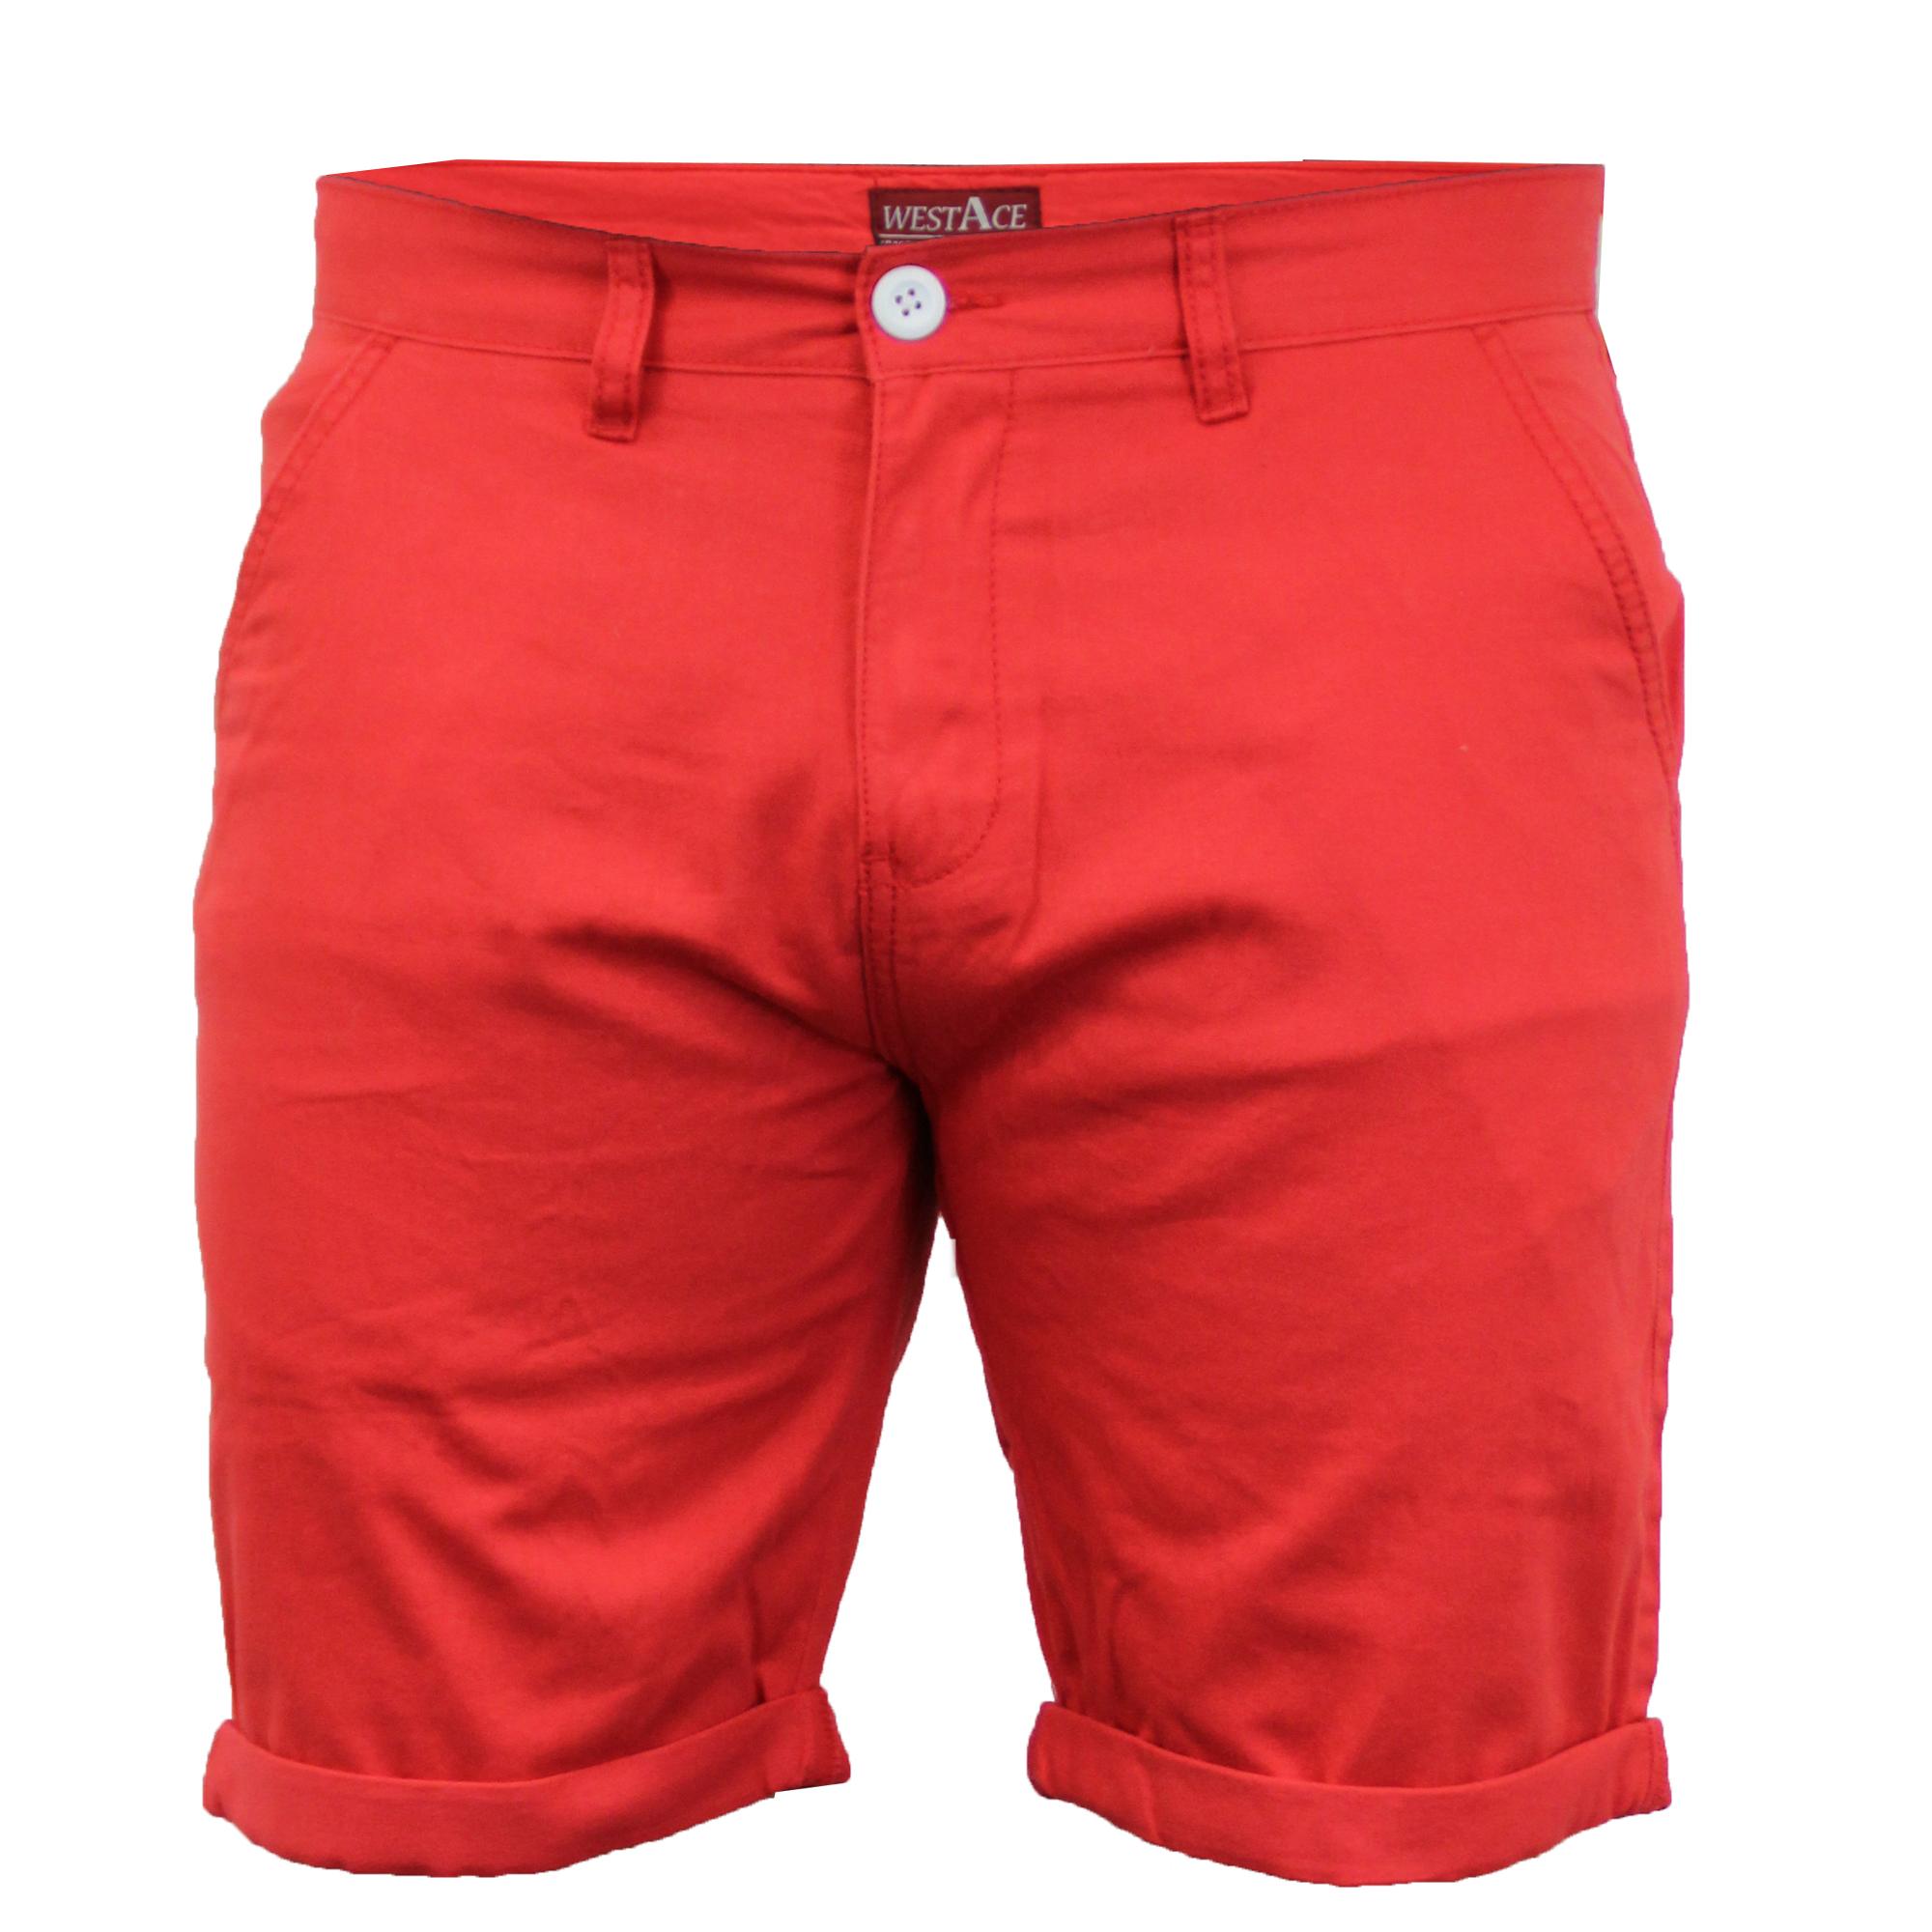 Mens Chino Shorts Threadbare Pants Westace Stallion Knee ...